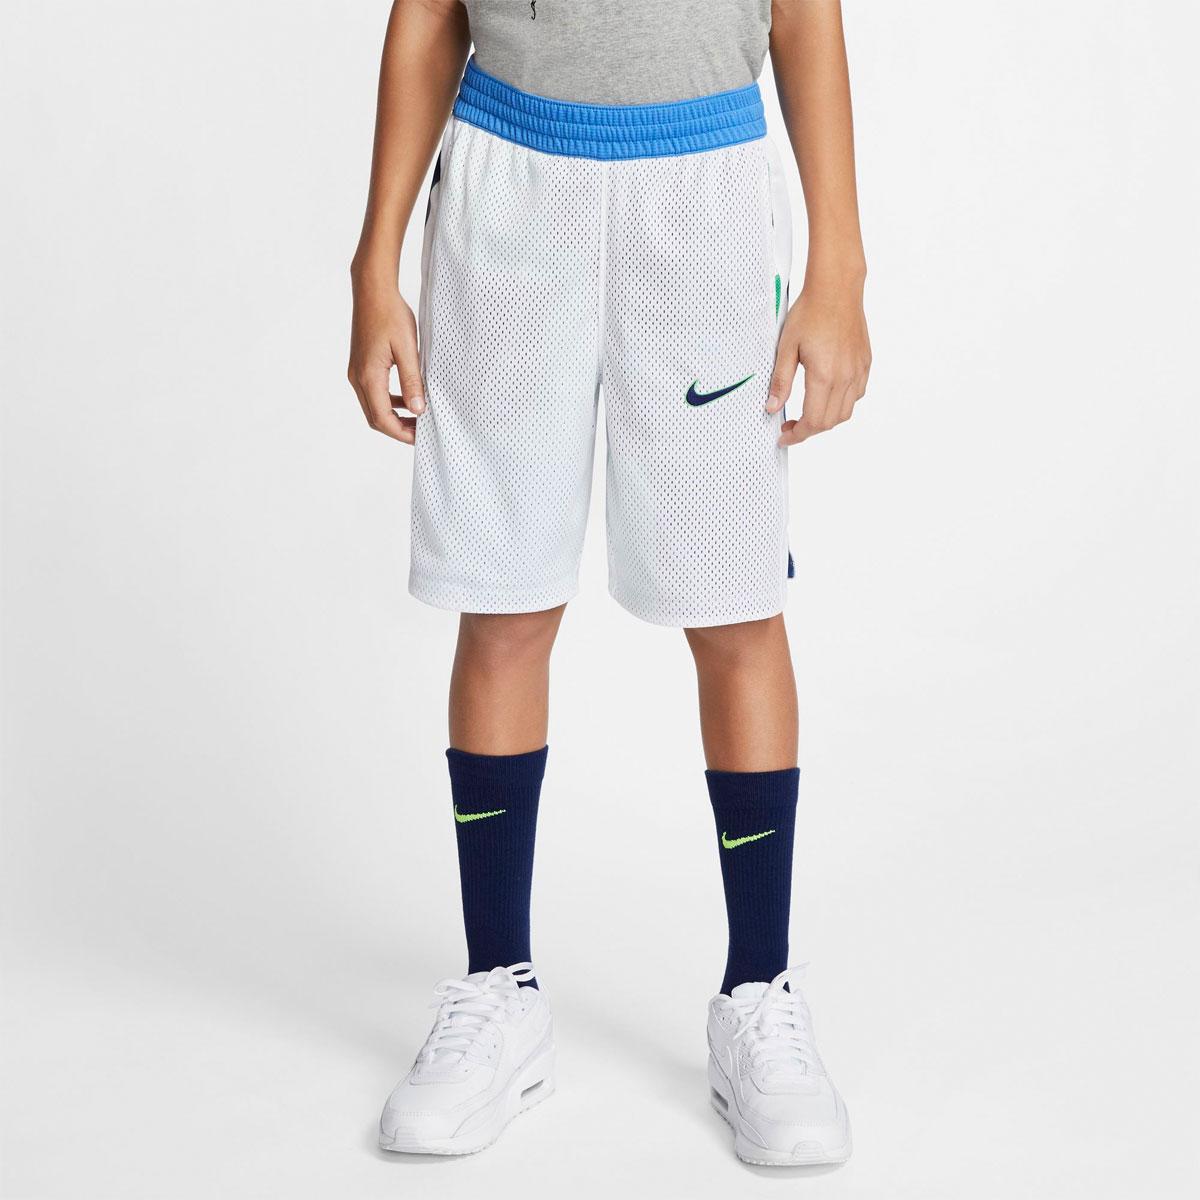 Boys' Elite Reversible Shorts, Blue, swatch